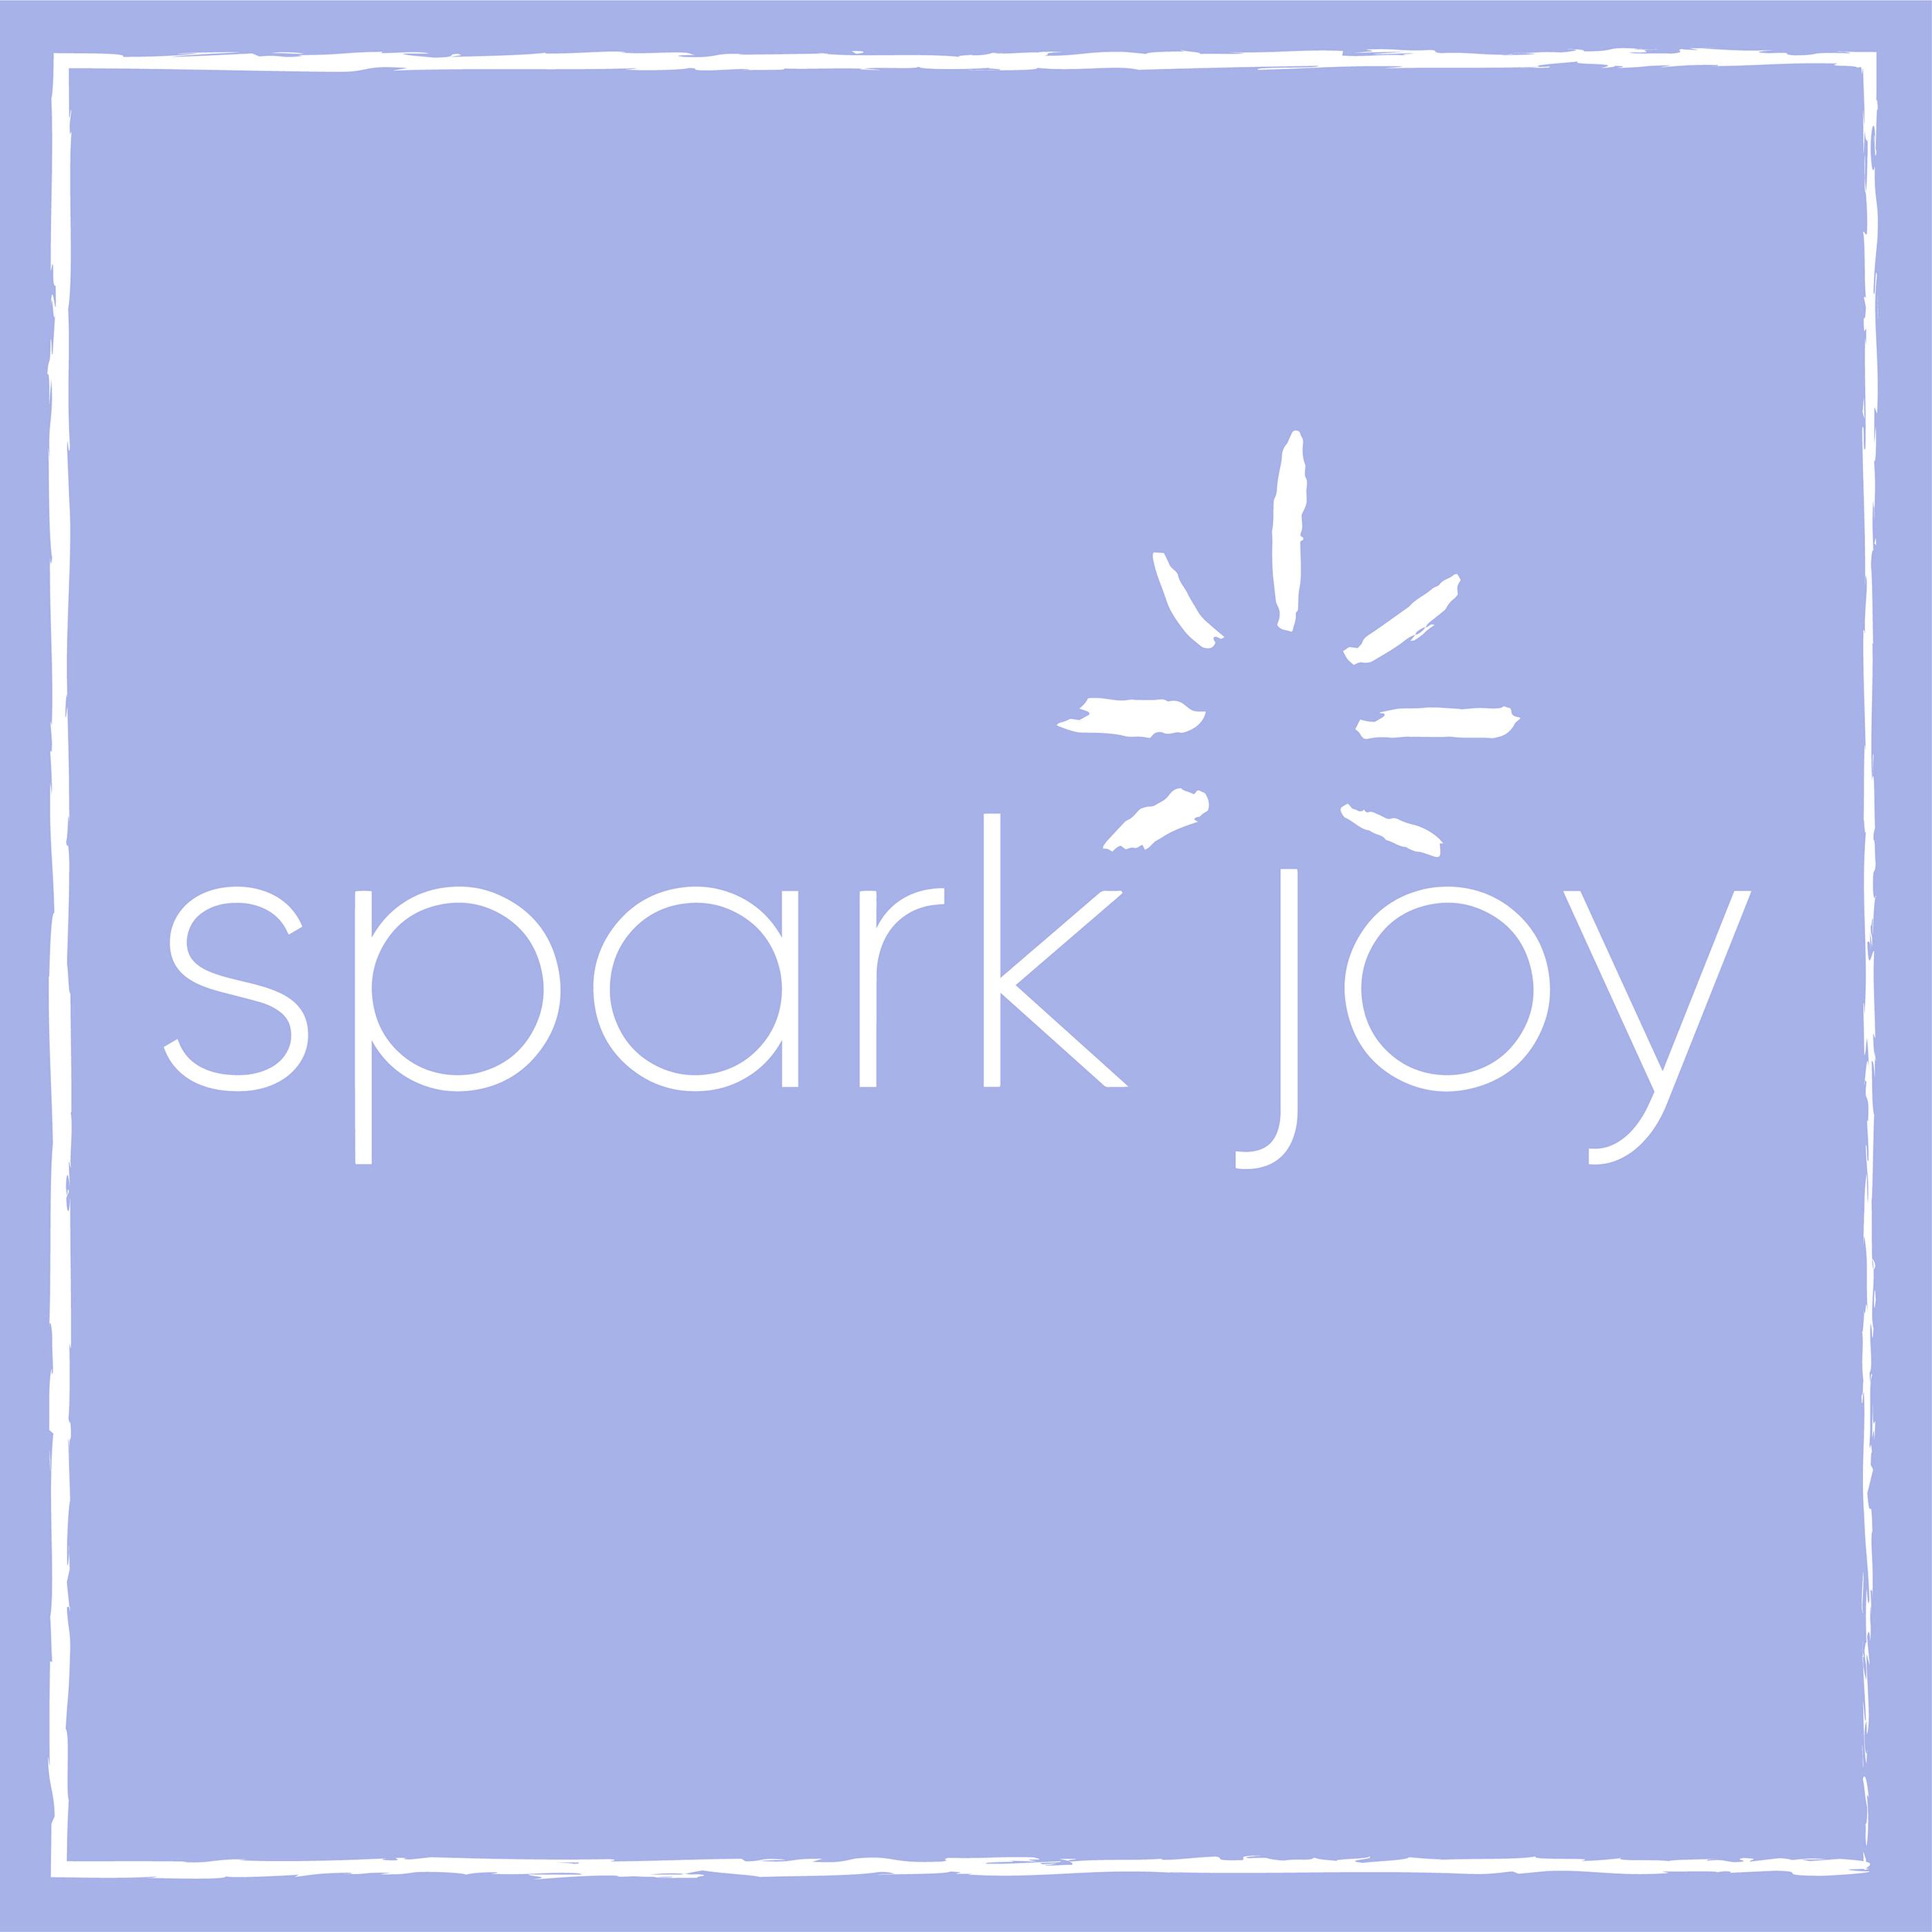 Spark Joy | Podbay